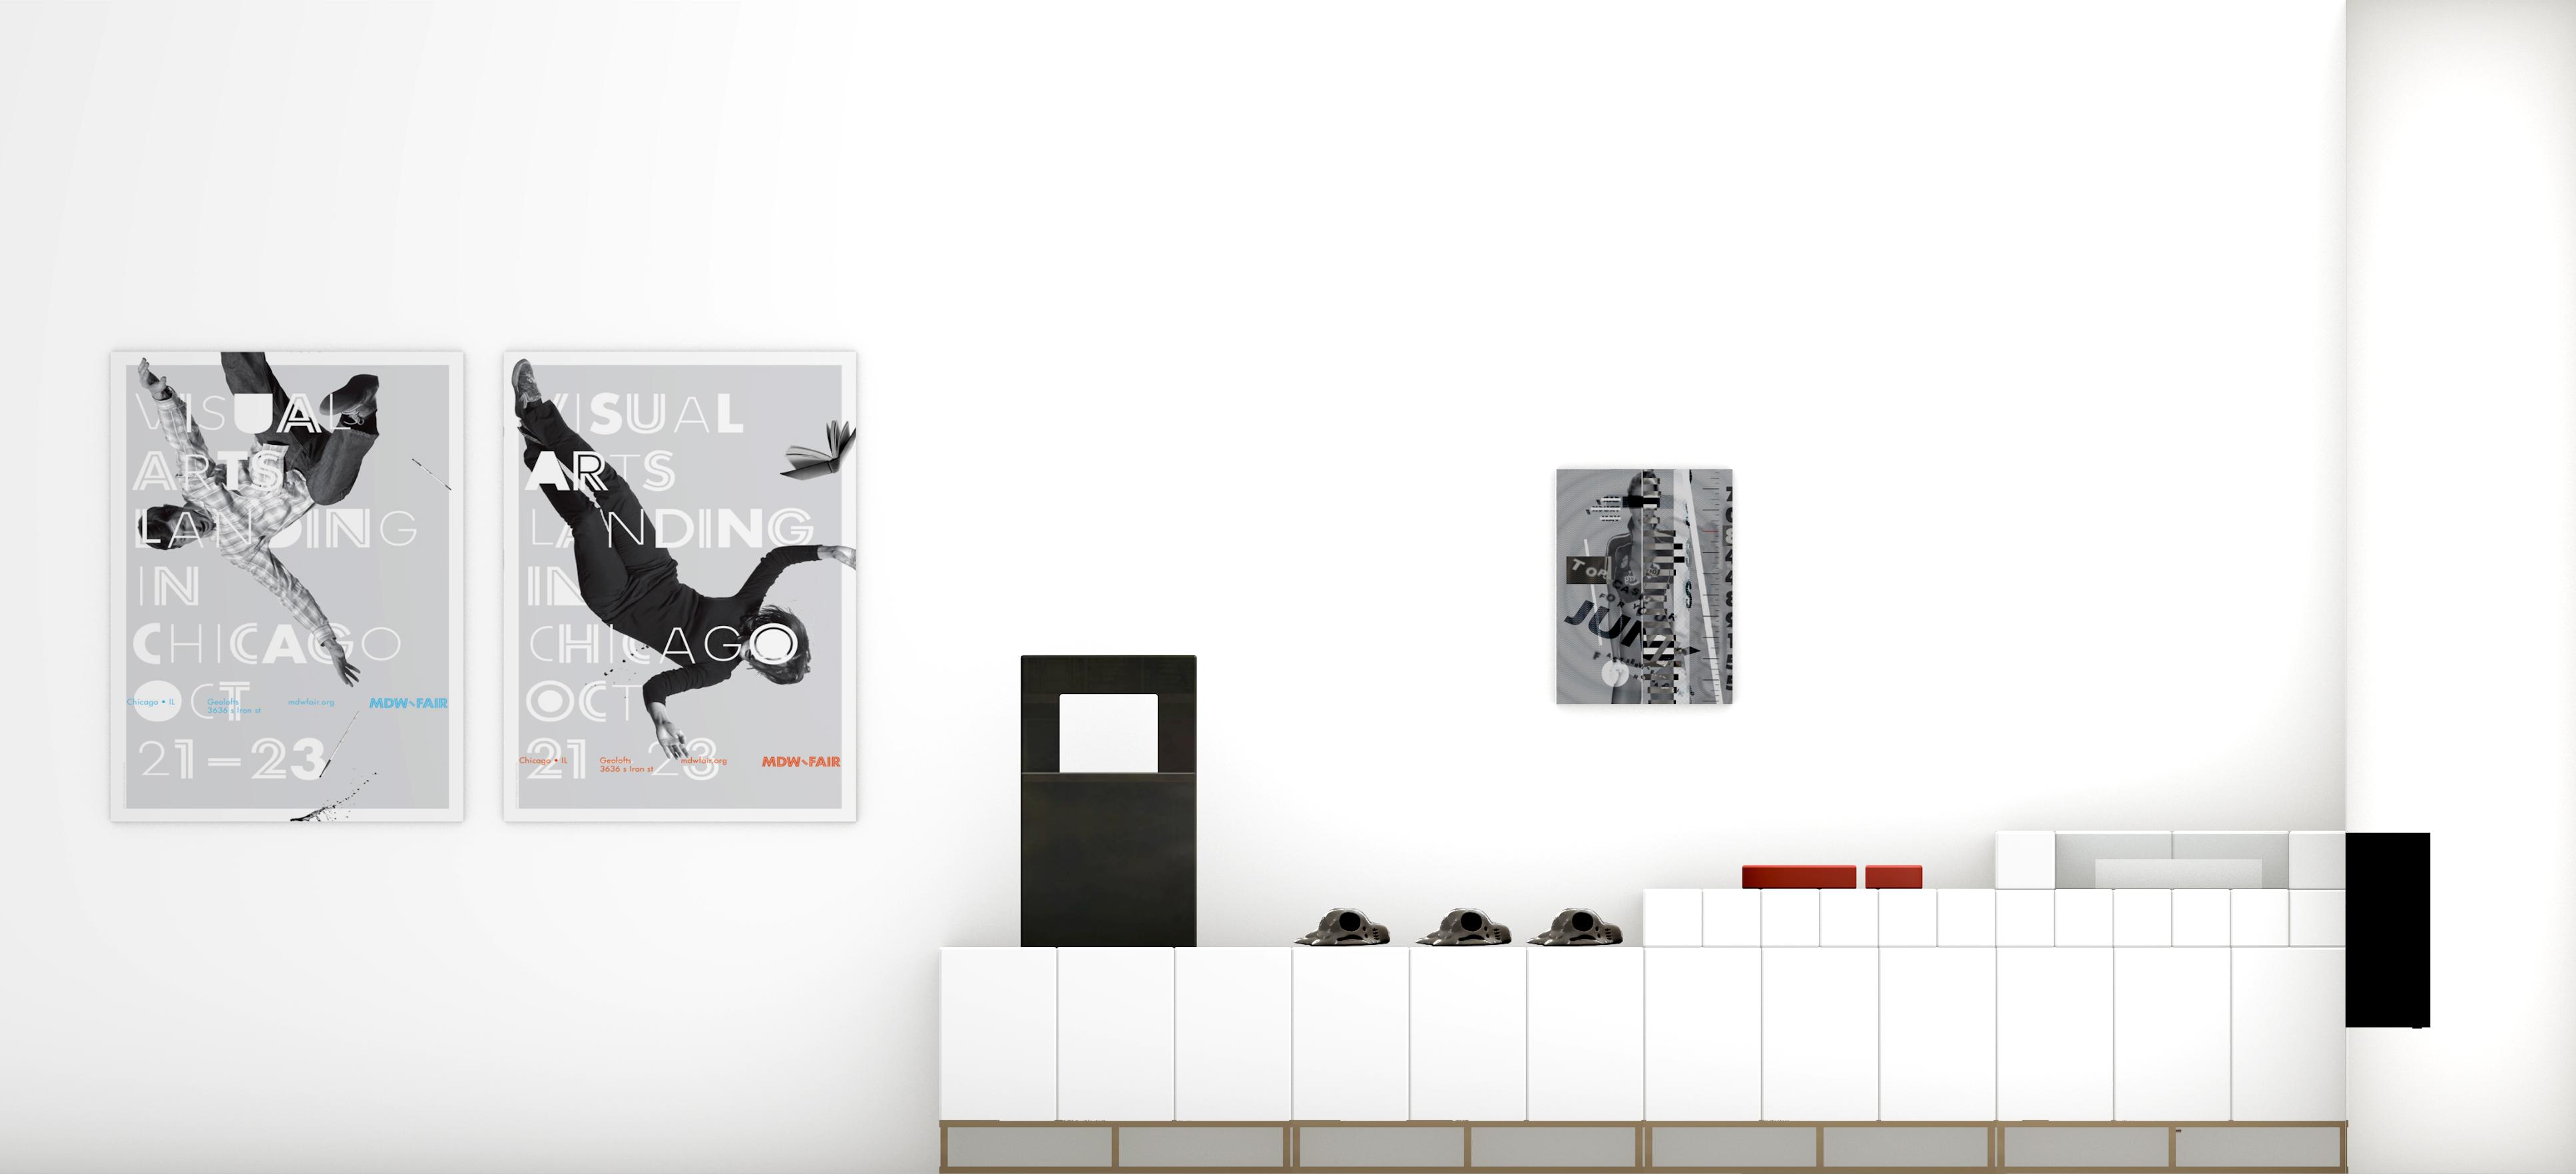 parsons communication design thesis 2011